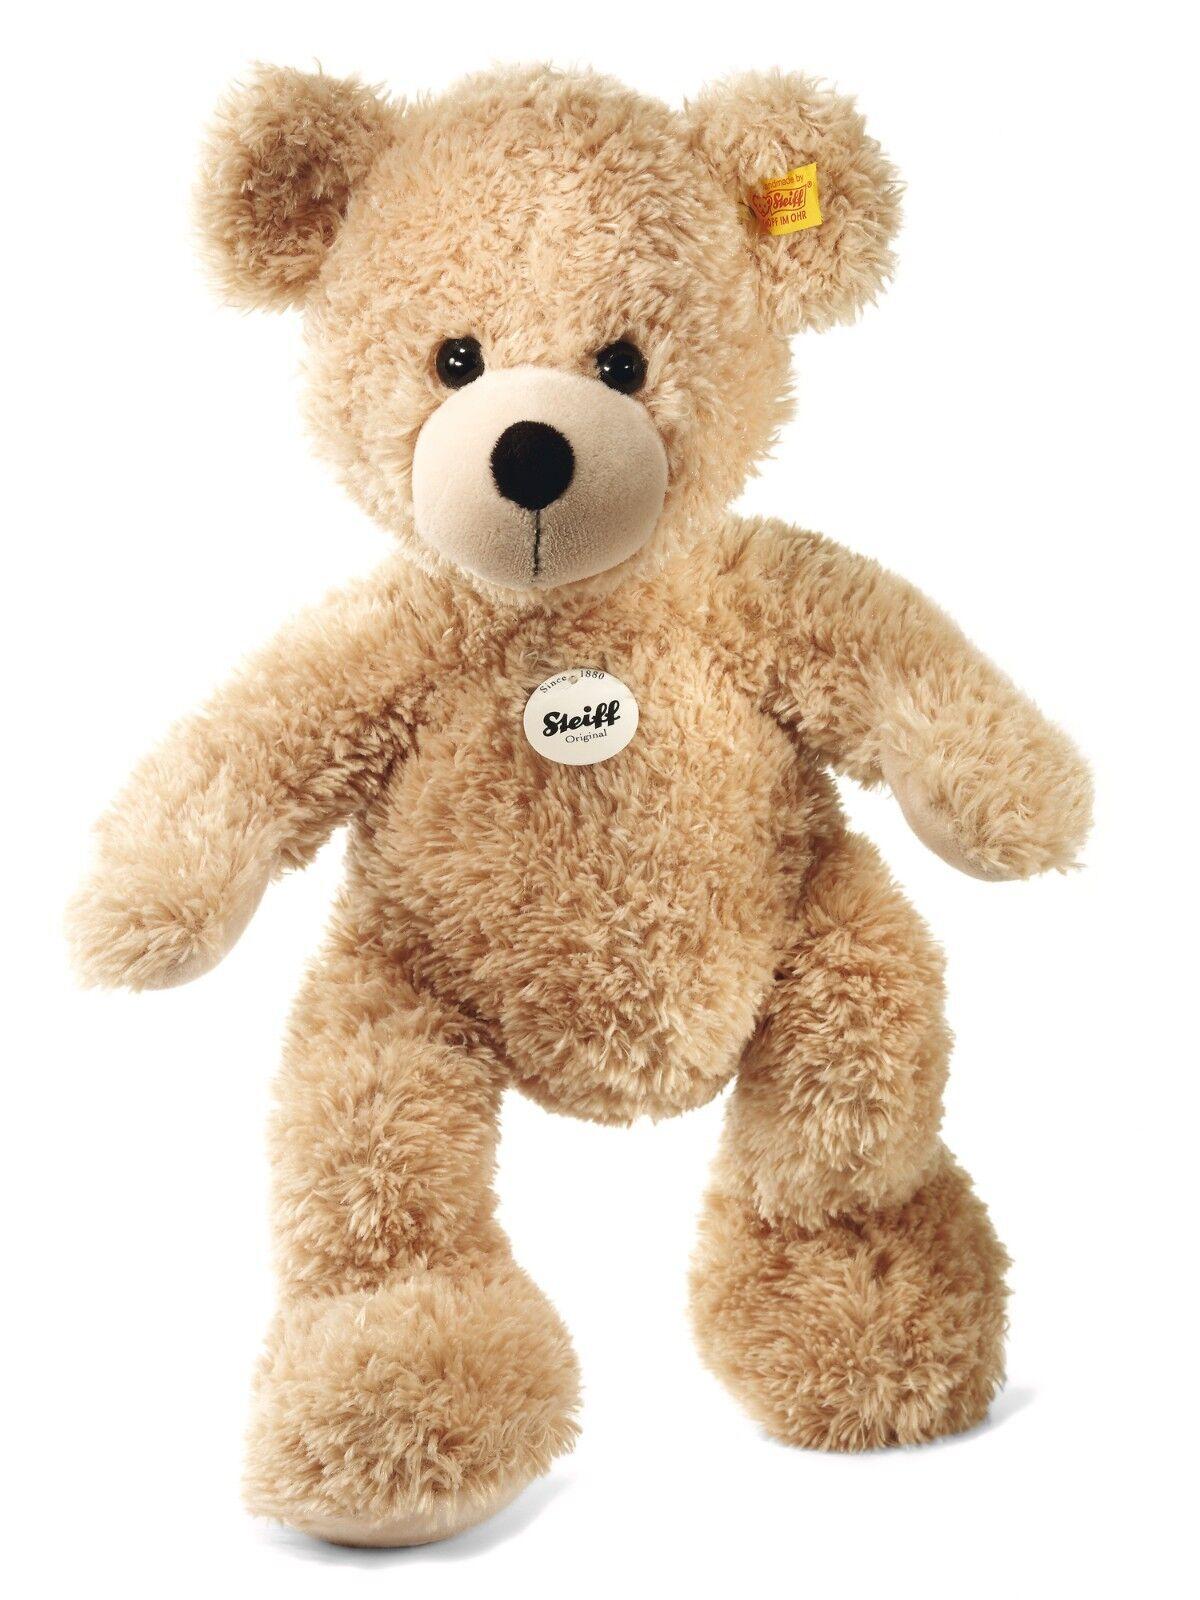 Steiff' Fynn 'waschbar kuscheligem Teddybär - 40cm - EAN 111679